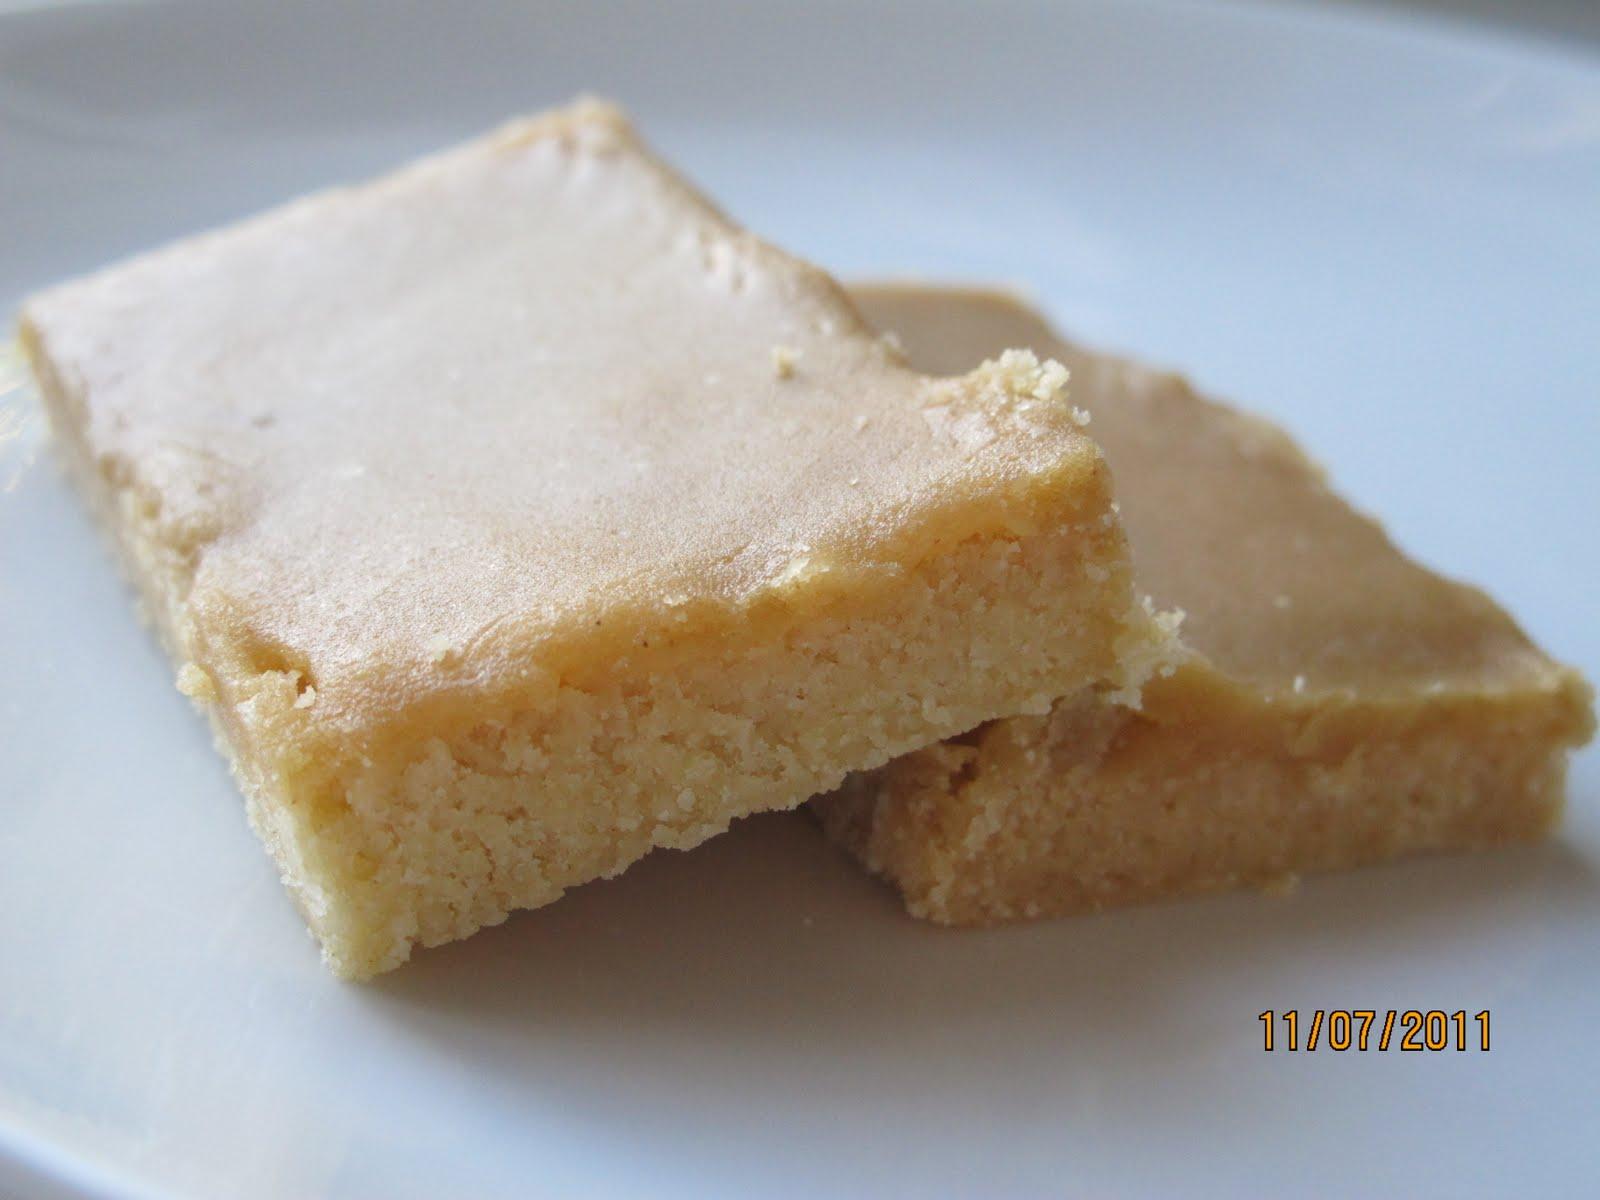 ... ginger crunch annabel langbein recipes ginger crunch millstream